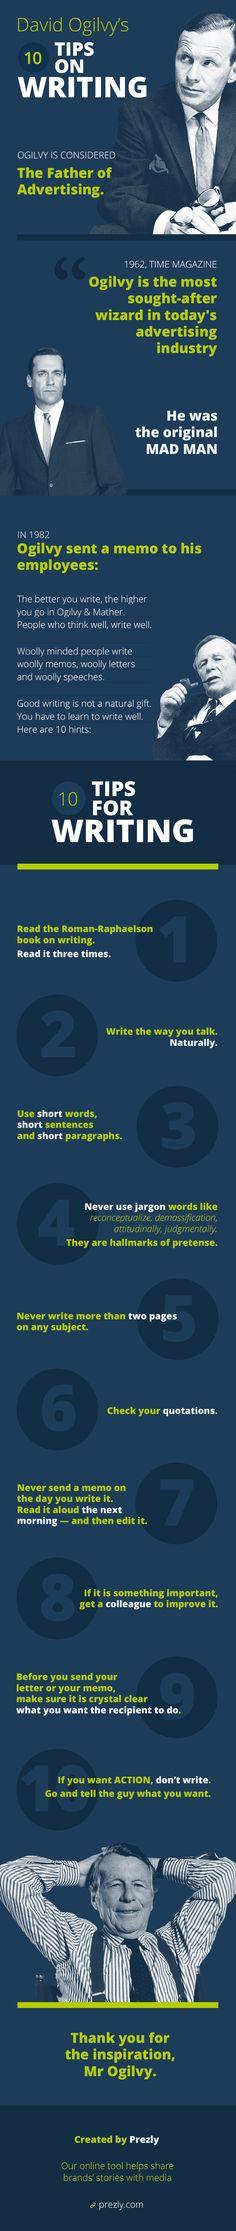 10 writing tips of original mad man David Ogilvy  #infographic #ogilvy #writing